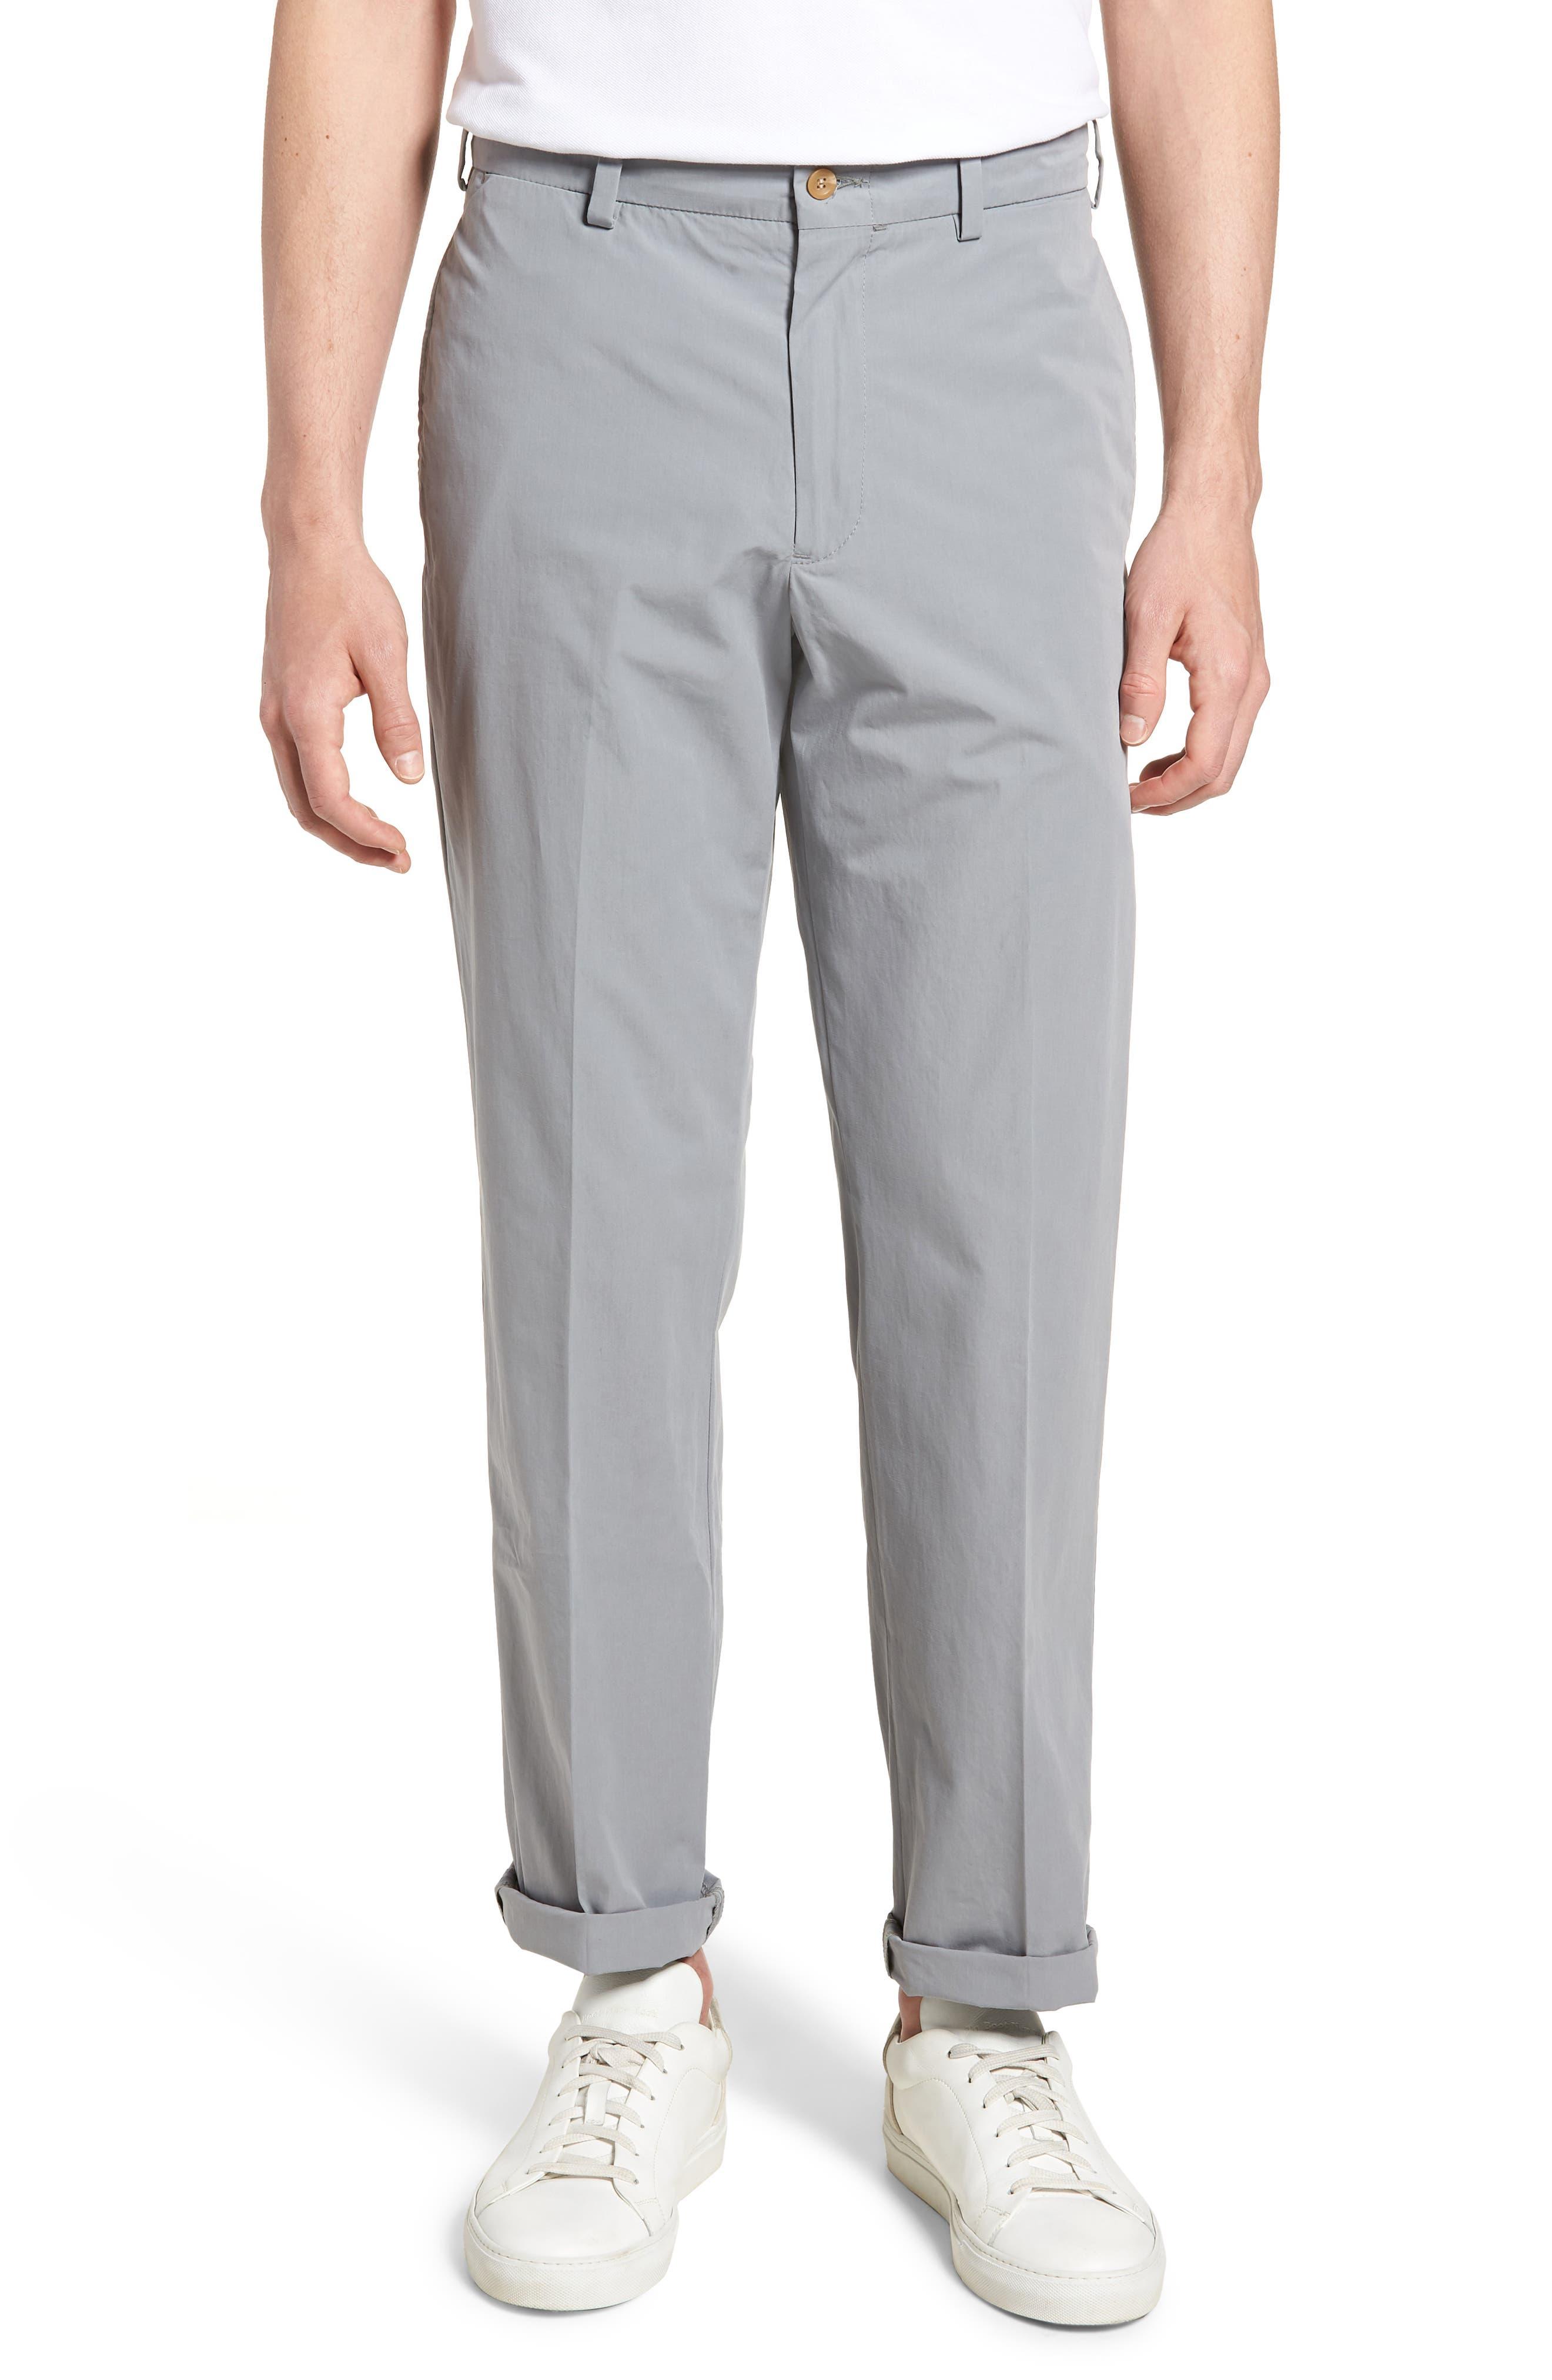 M2 Classic Fit Flat Front Tropical Cotton Poplin Pants,                             Main thumbnail 1, color,                             Nickel